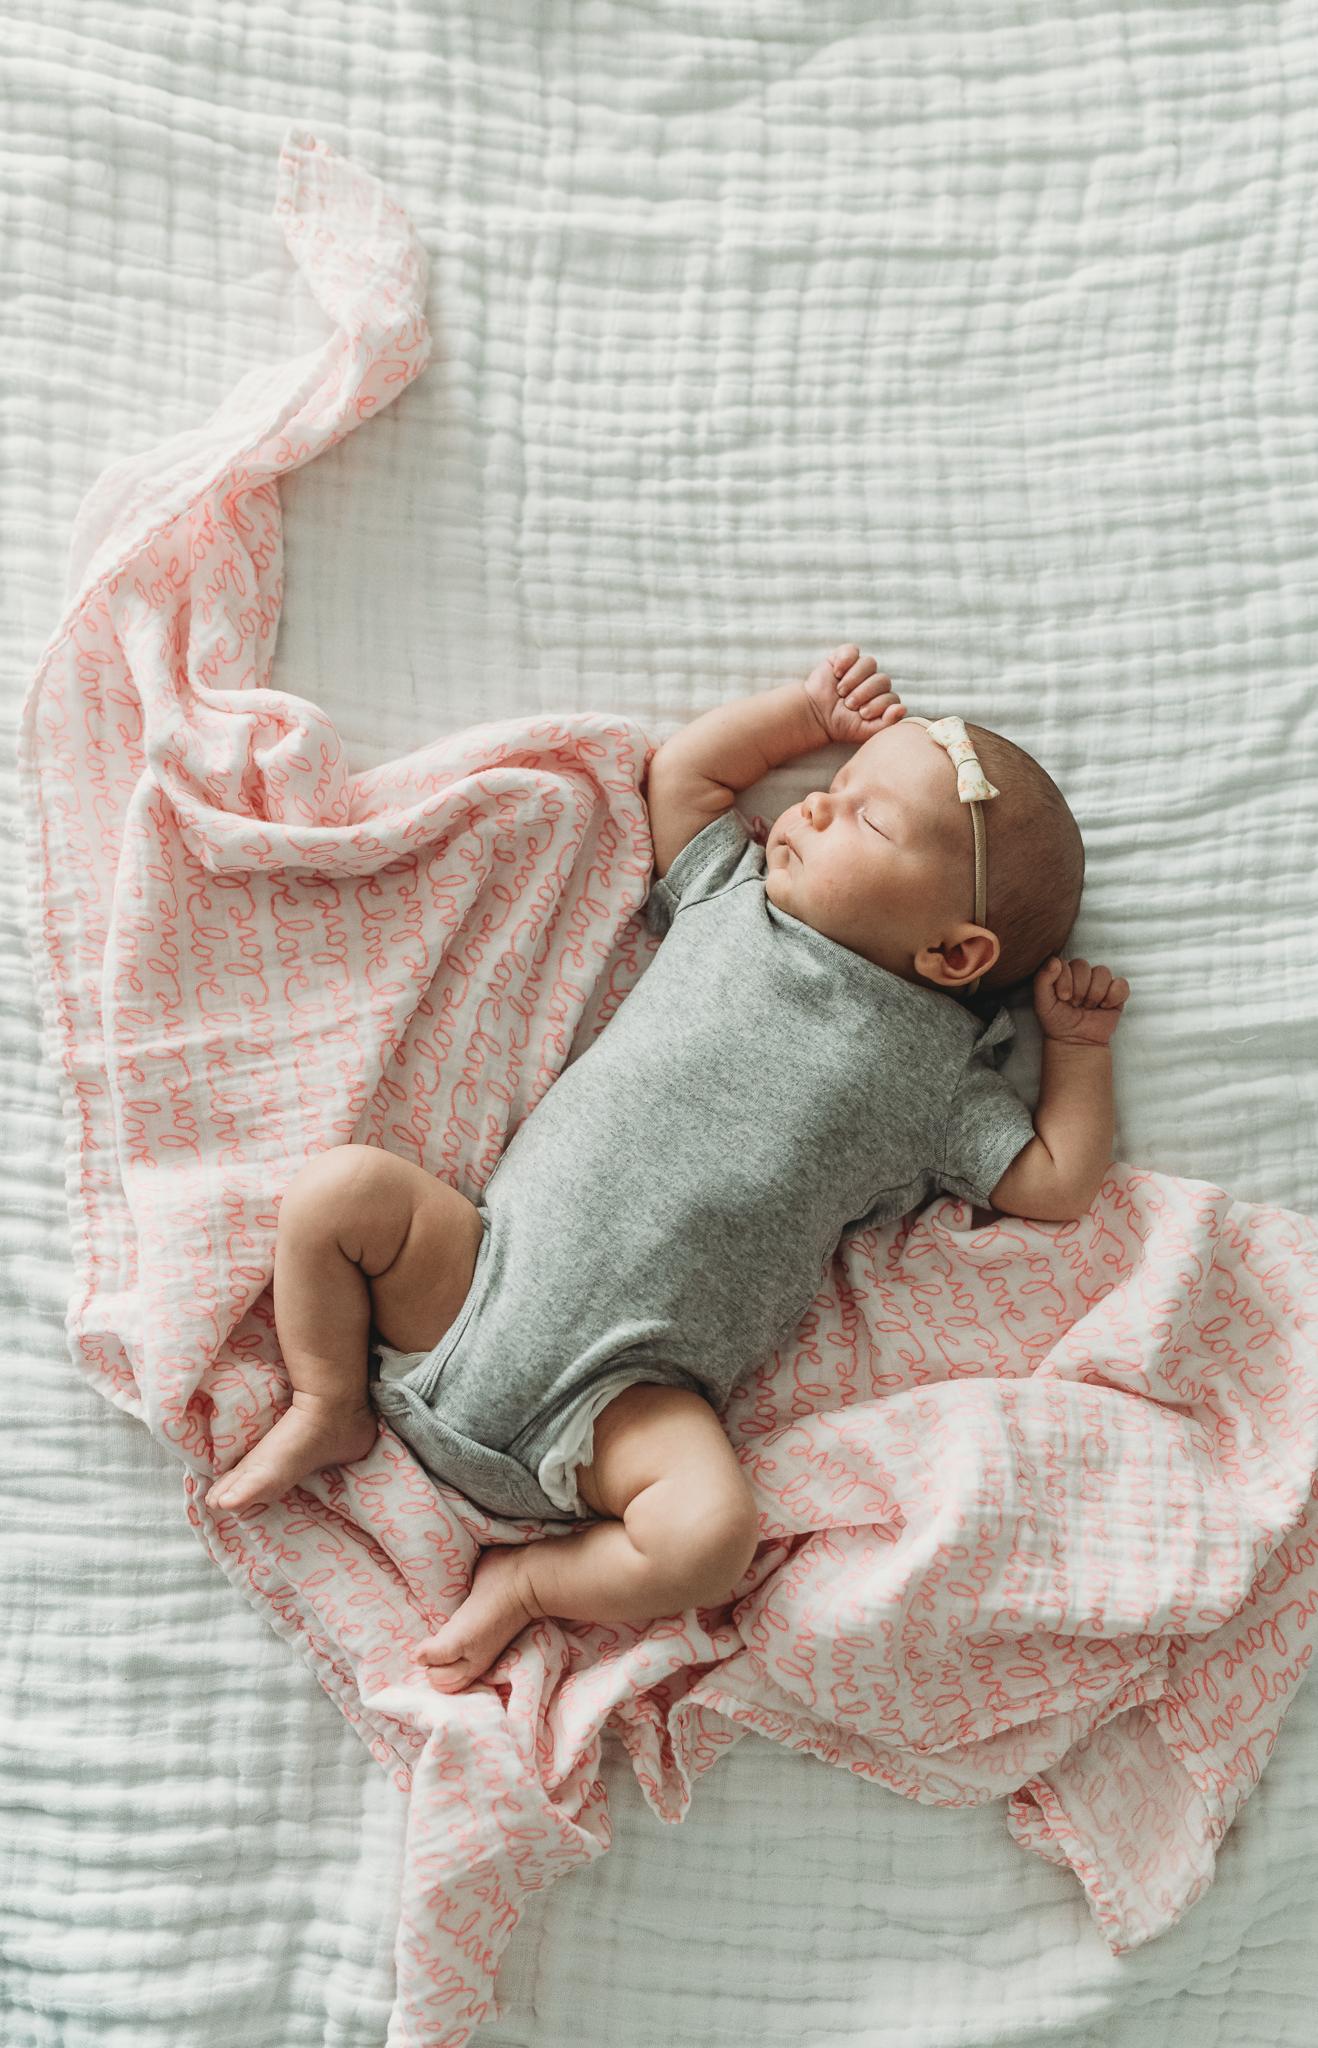 austin-lifestyle-newborn-photographer-8058.jpg